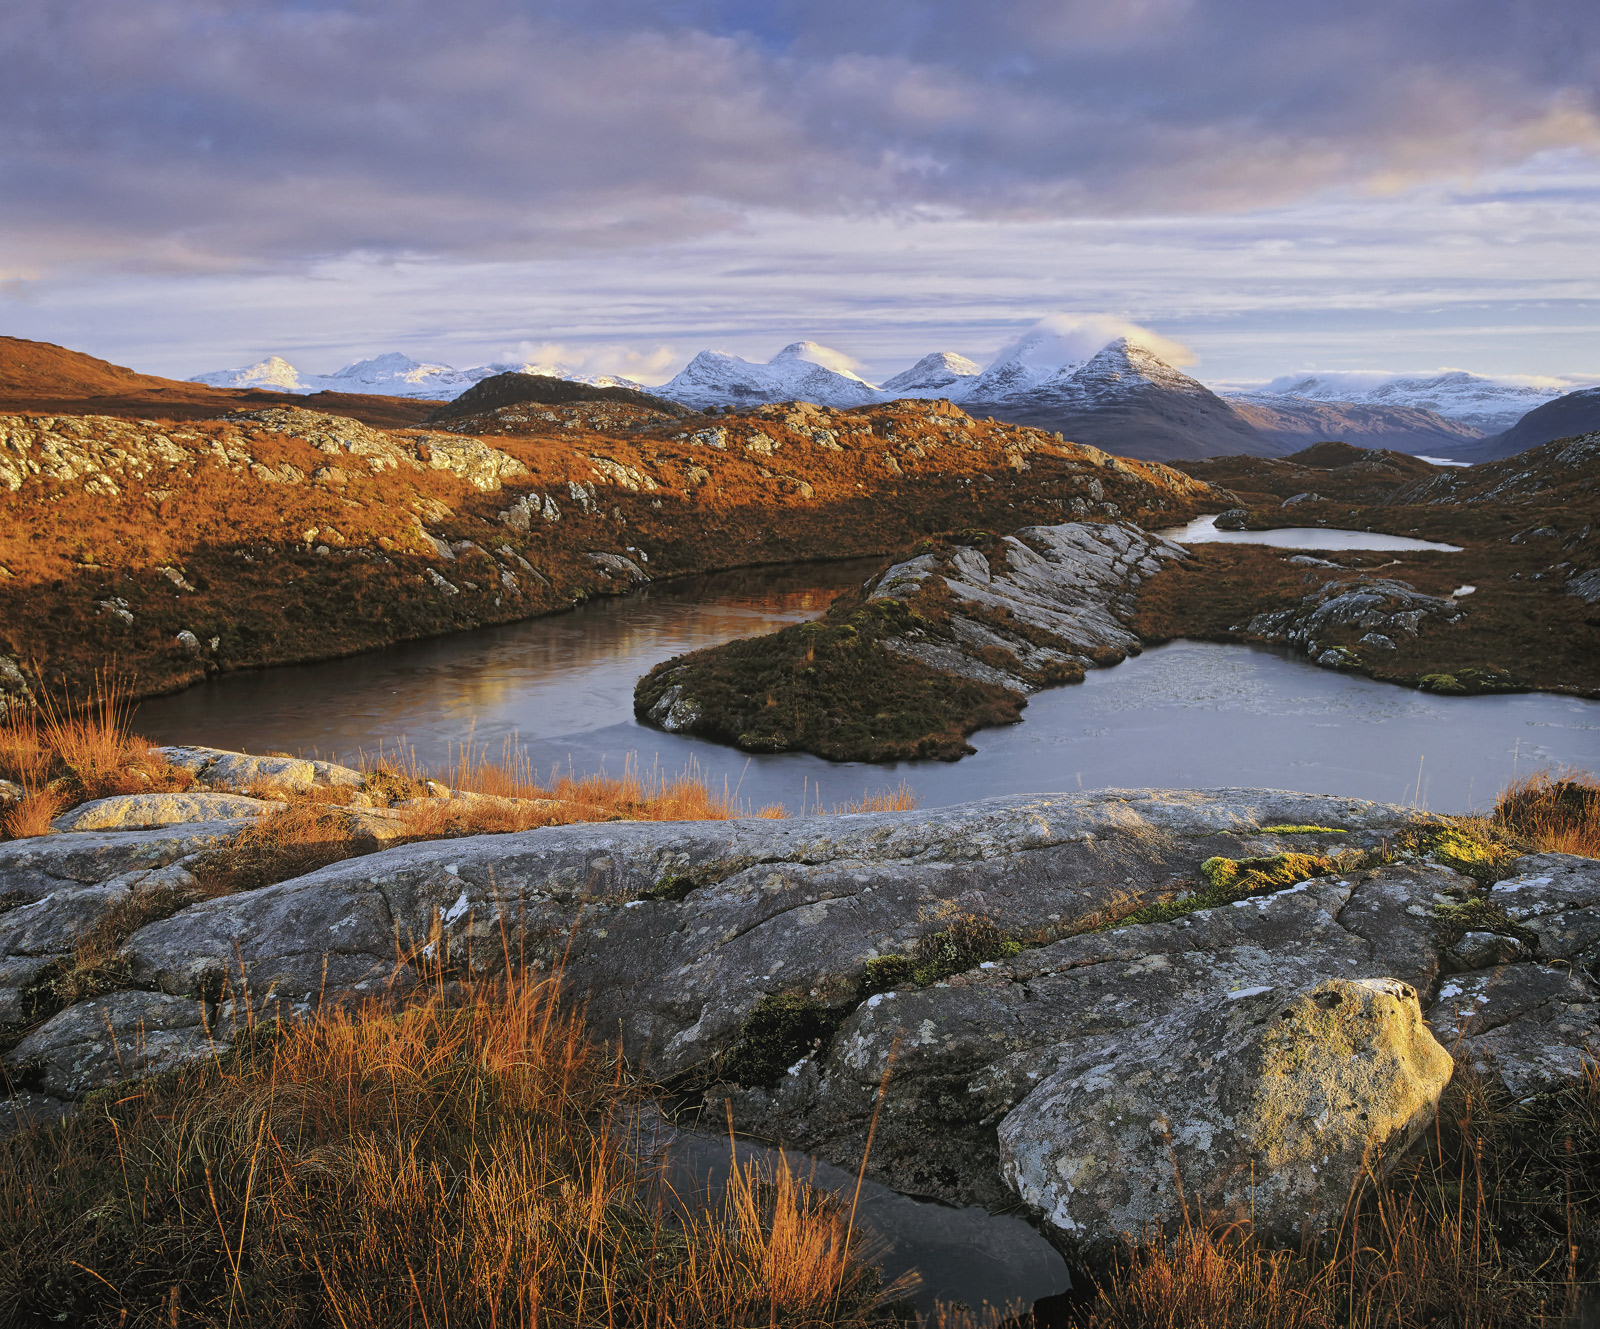 Jaws of Torridon, Diabaig, Torridon, Scotland, jagged, blue, teeth, snow, mountains, deer grass, moorland, lochan, tongu, photo